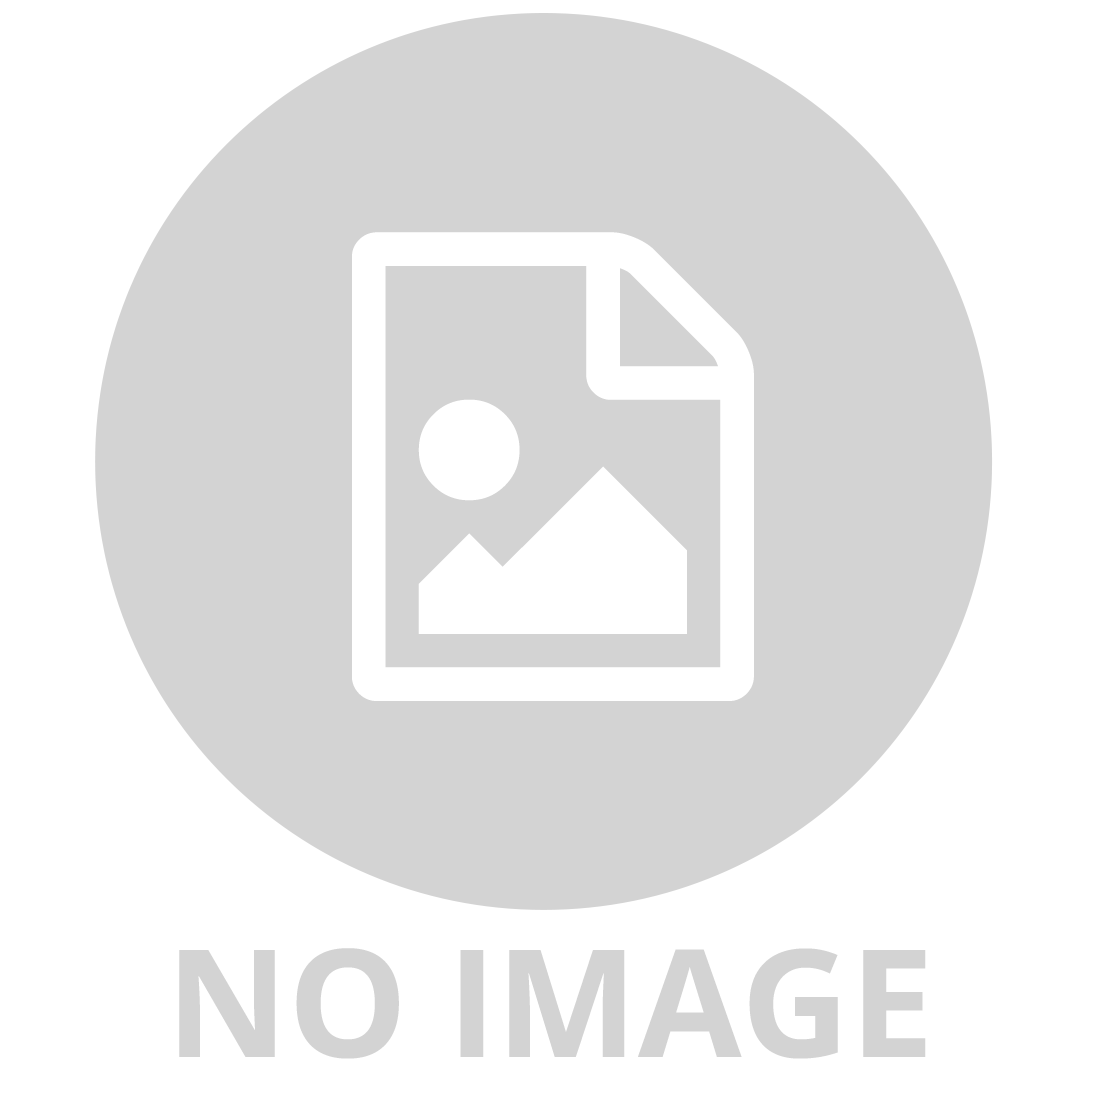 LEGO 41253 TROLLS WORLD TOUR LONESOME FLATS RAFT ADVENTURE